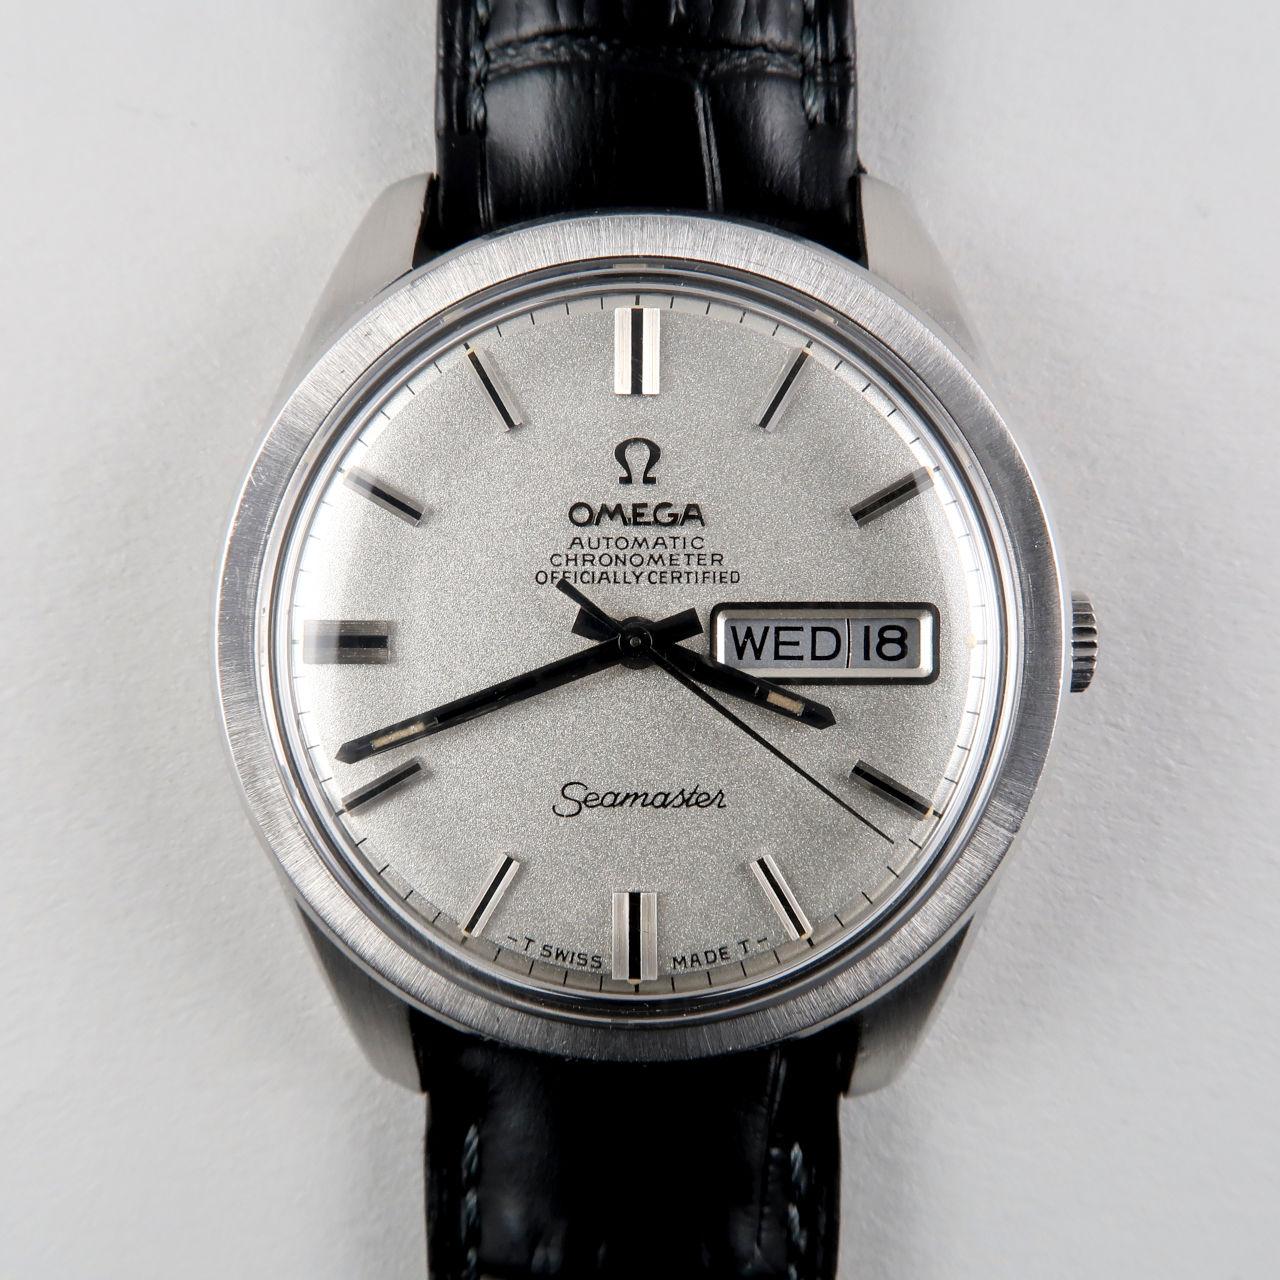 Omega Seamaster Chronometer Ref.168.023 circa 1969